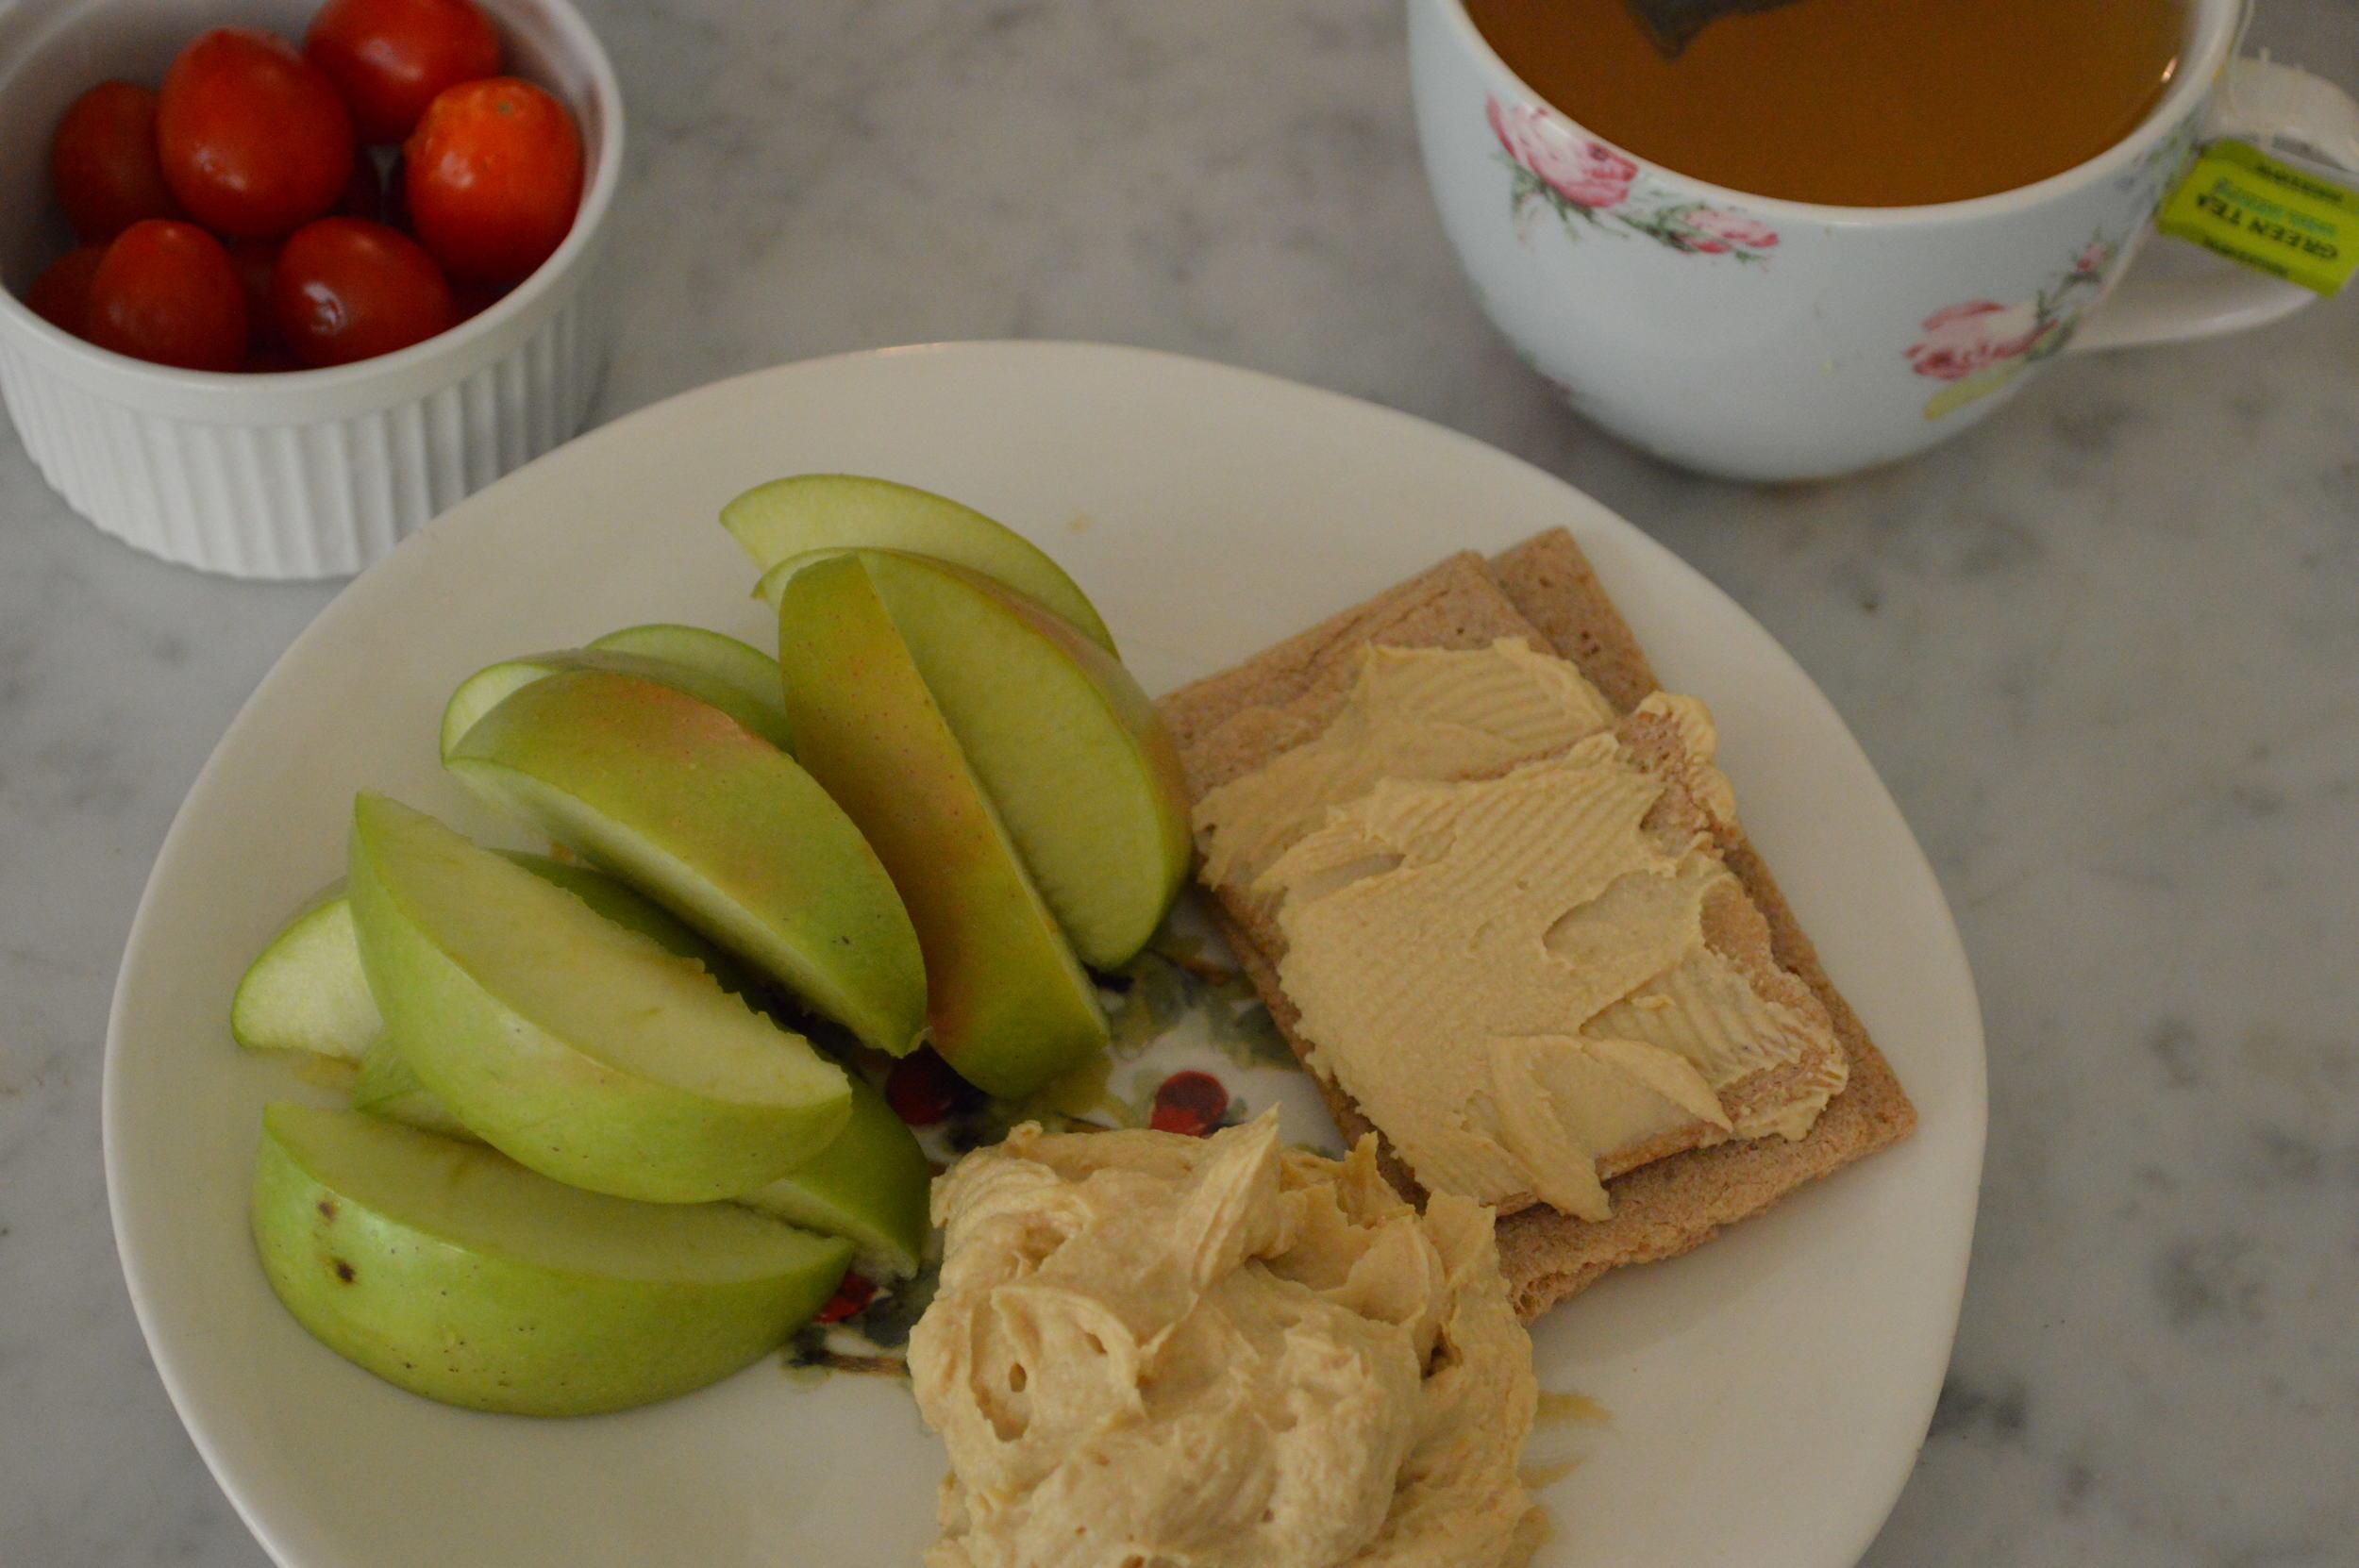 Green Apple + Hummus & Tomatoes